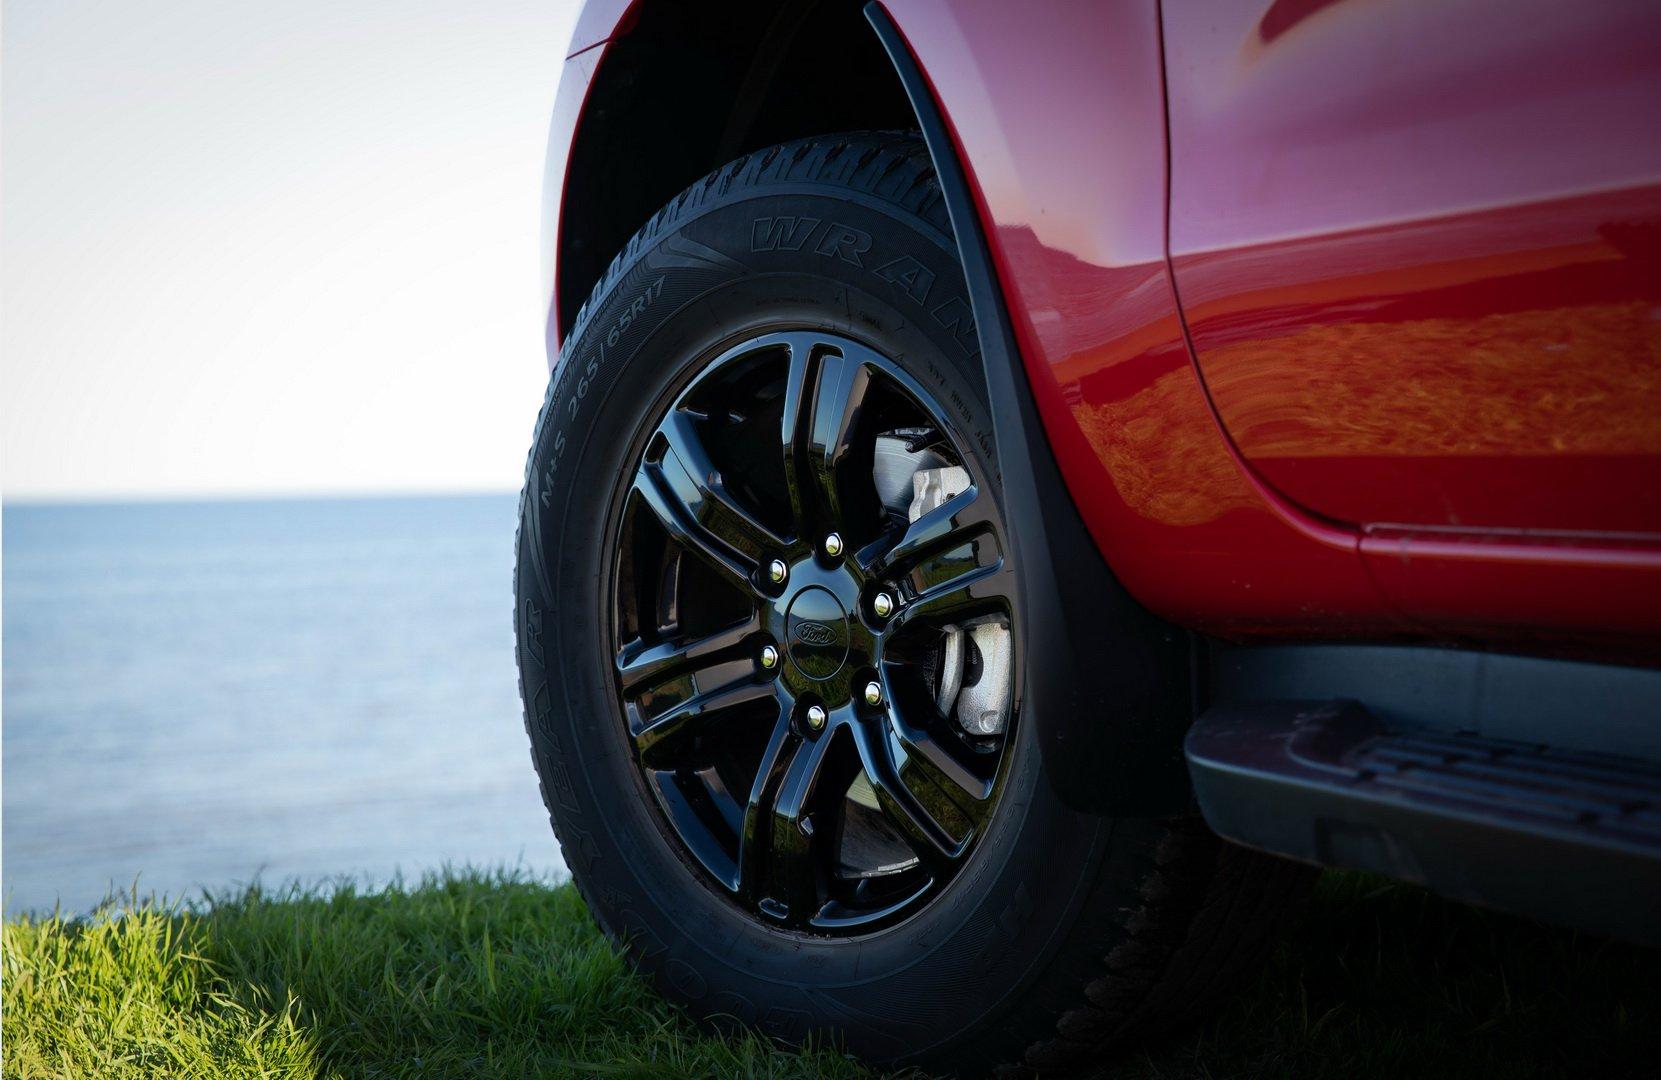 2019-ford-ranger-sport-special-edition-australia-6.jpg